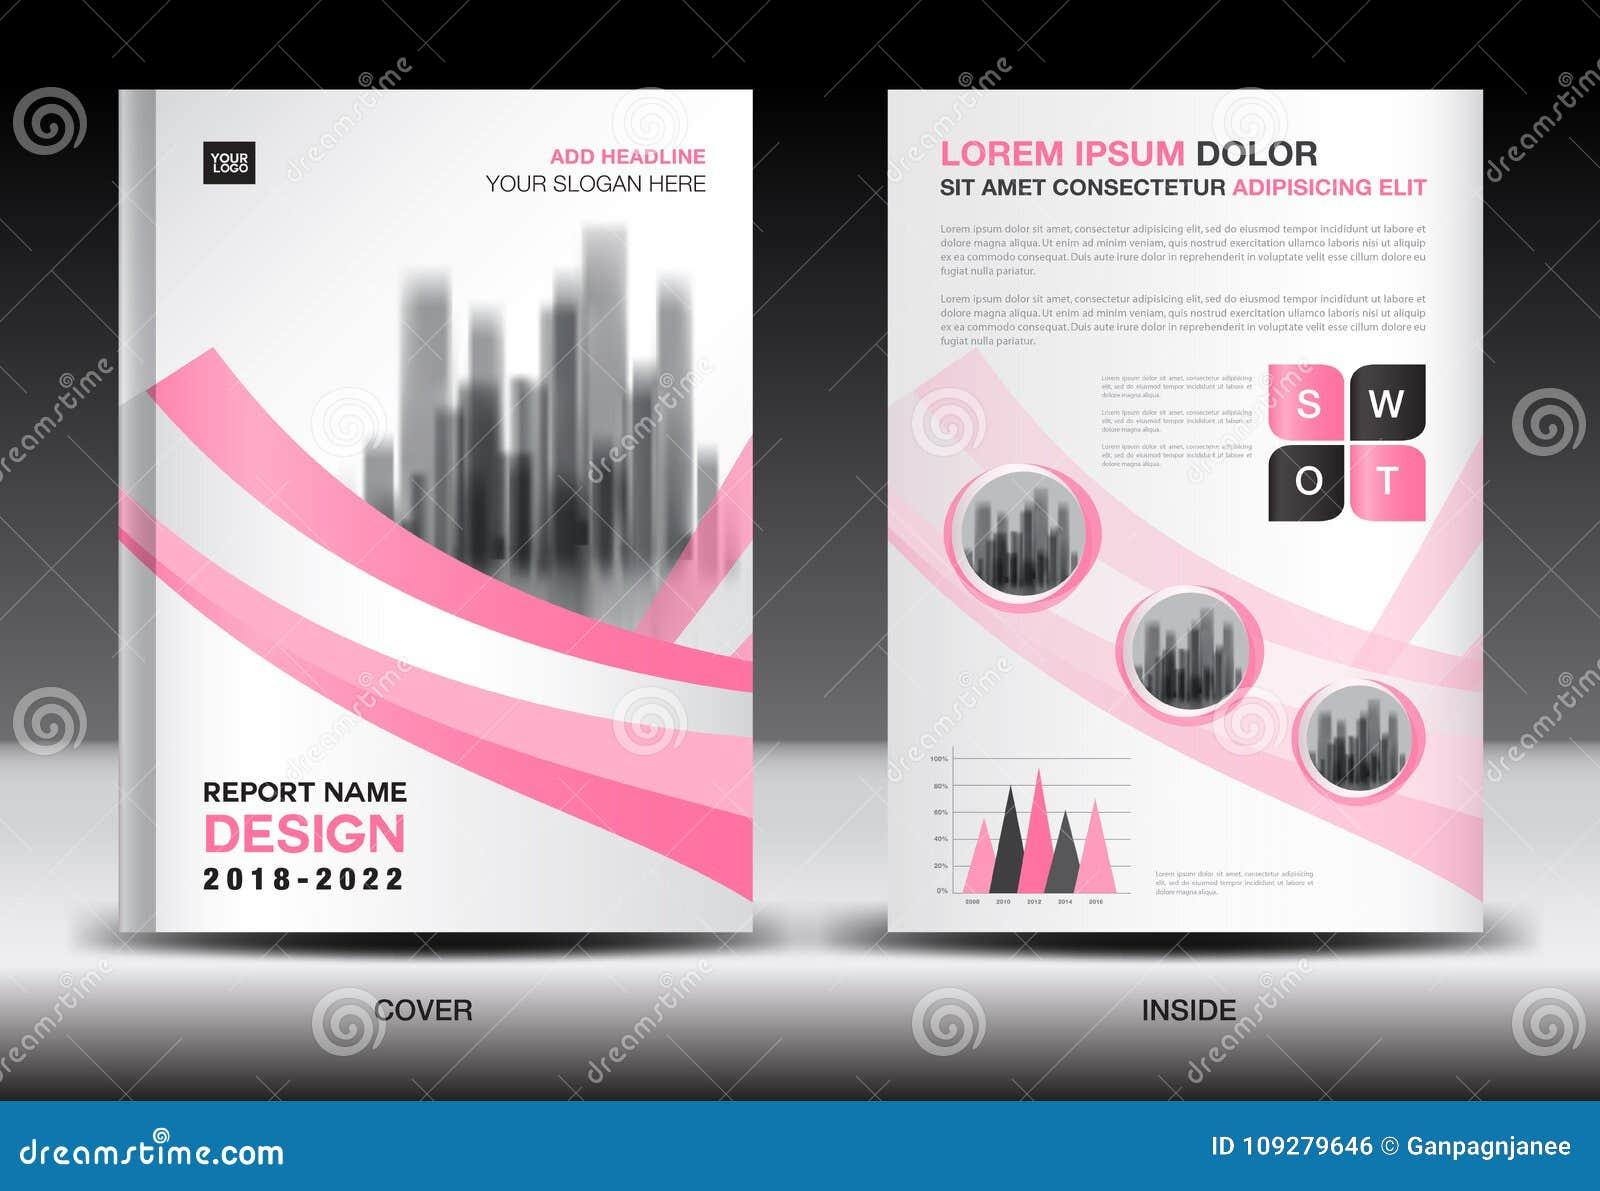 Annual Report Cover Design Brochure Flyer Template Business Advertisement Company Profile Stock Vector Illustration Of Magazine Annual 109279646